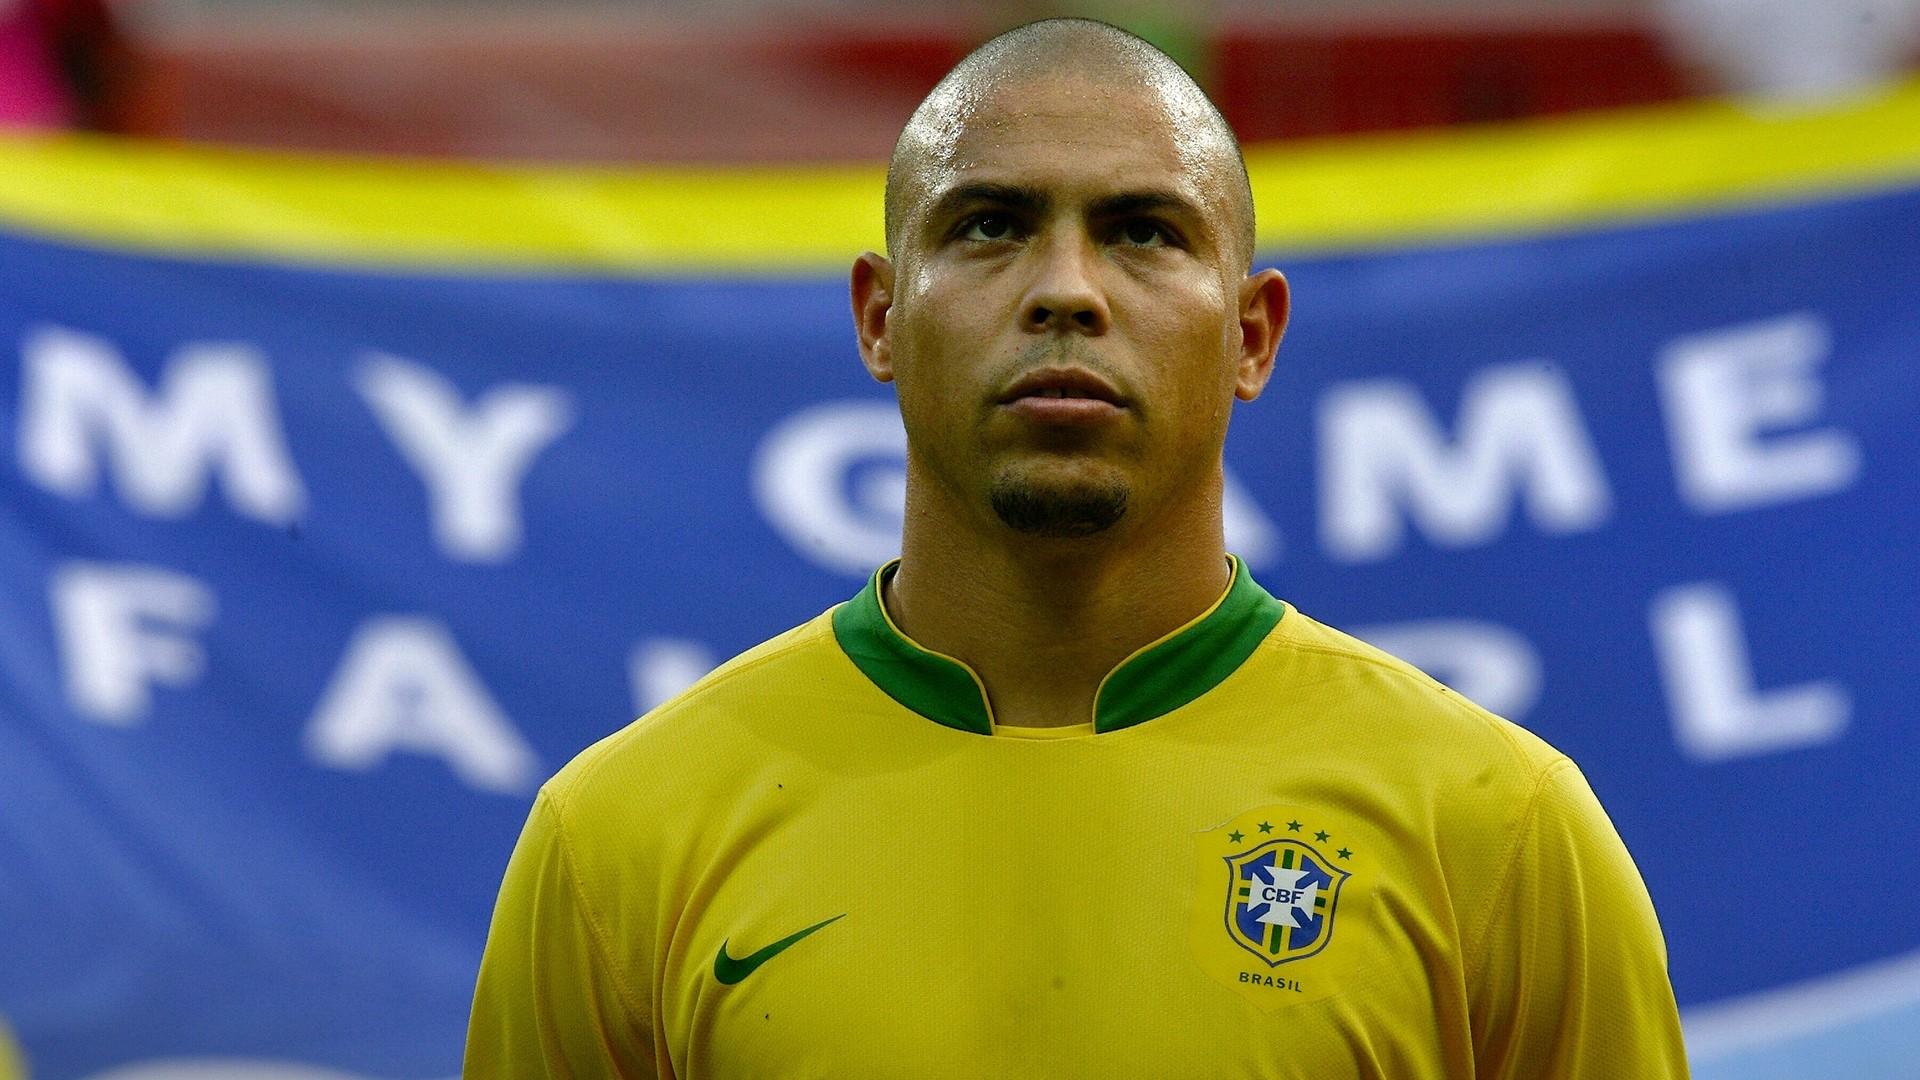 Ronaldo Football Star Hd Wallpaper Iphone 7 Plus Iphone 8